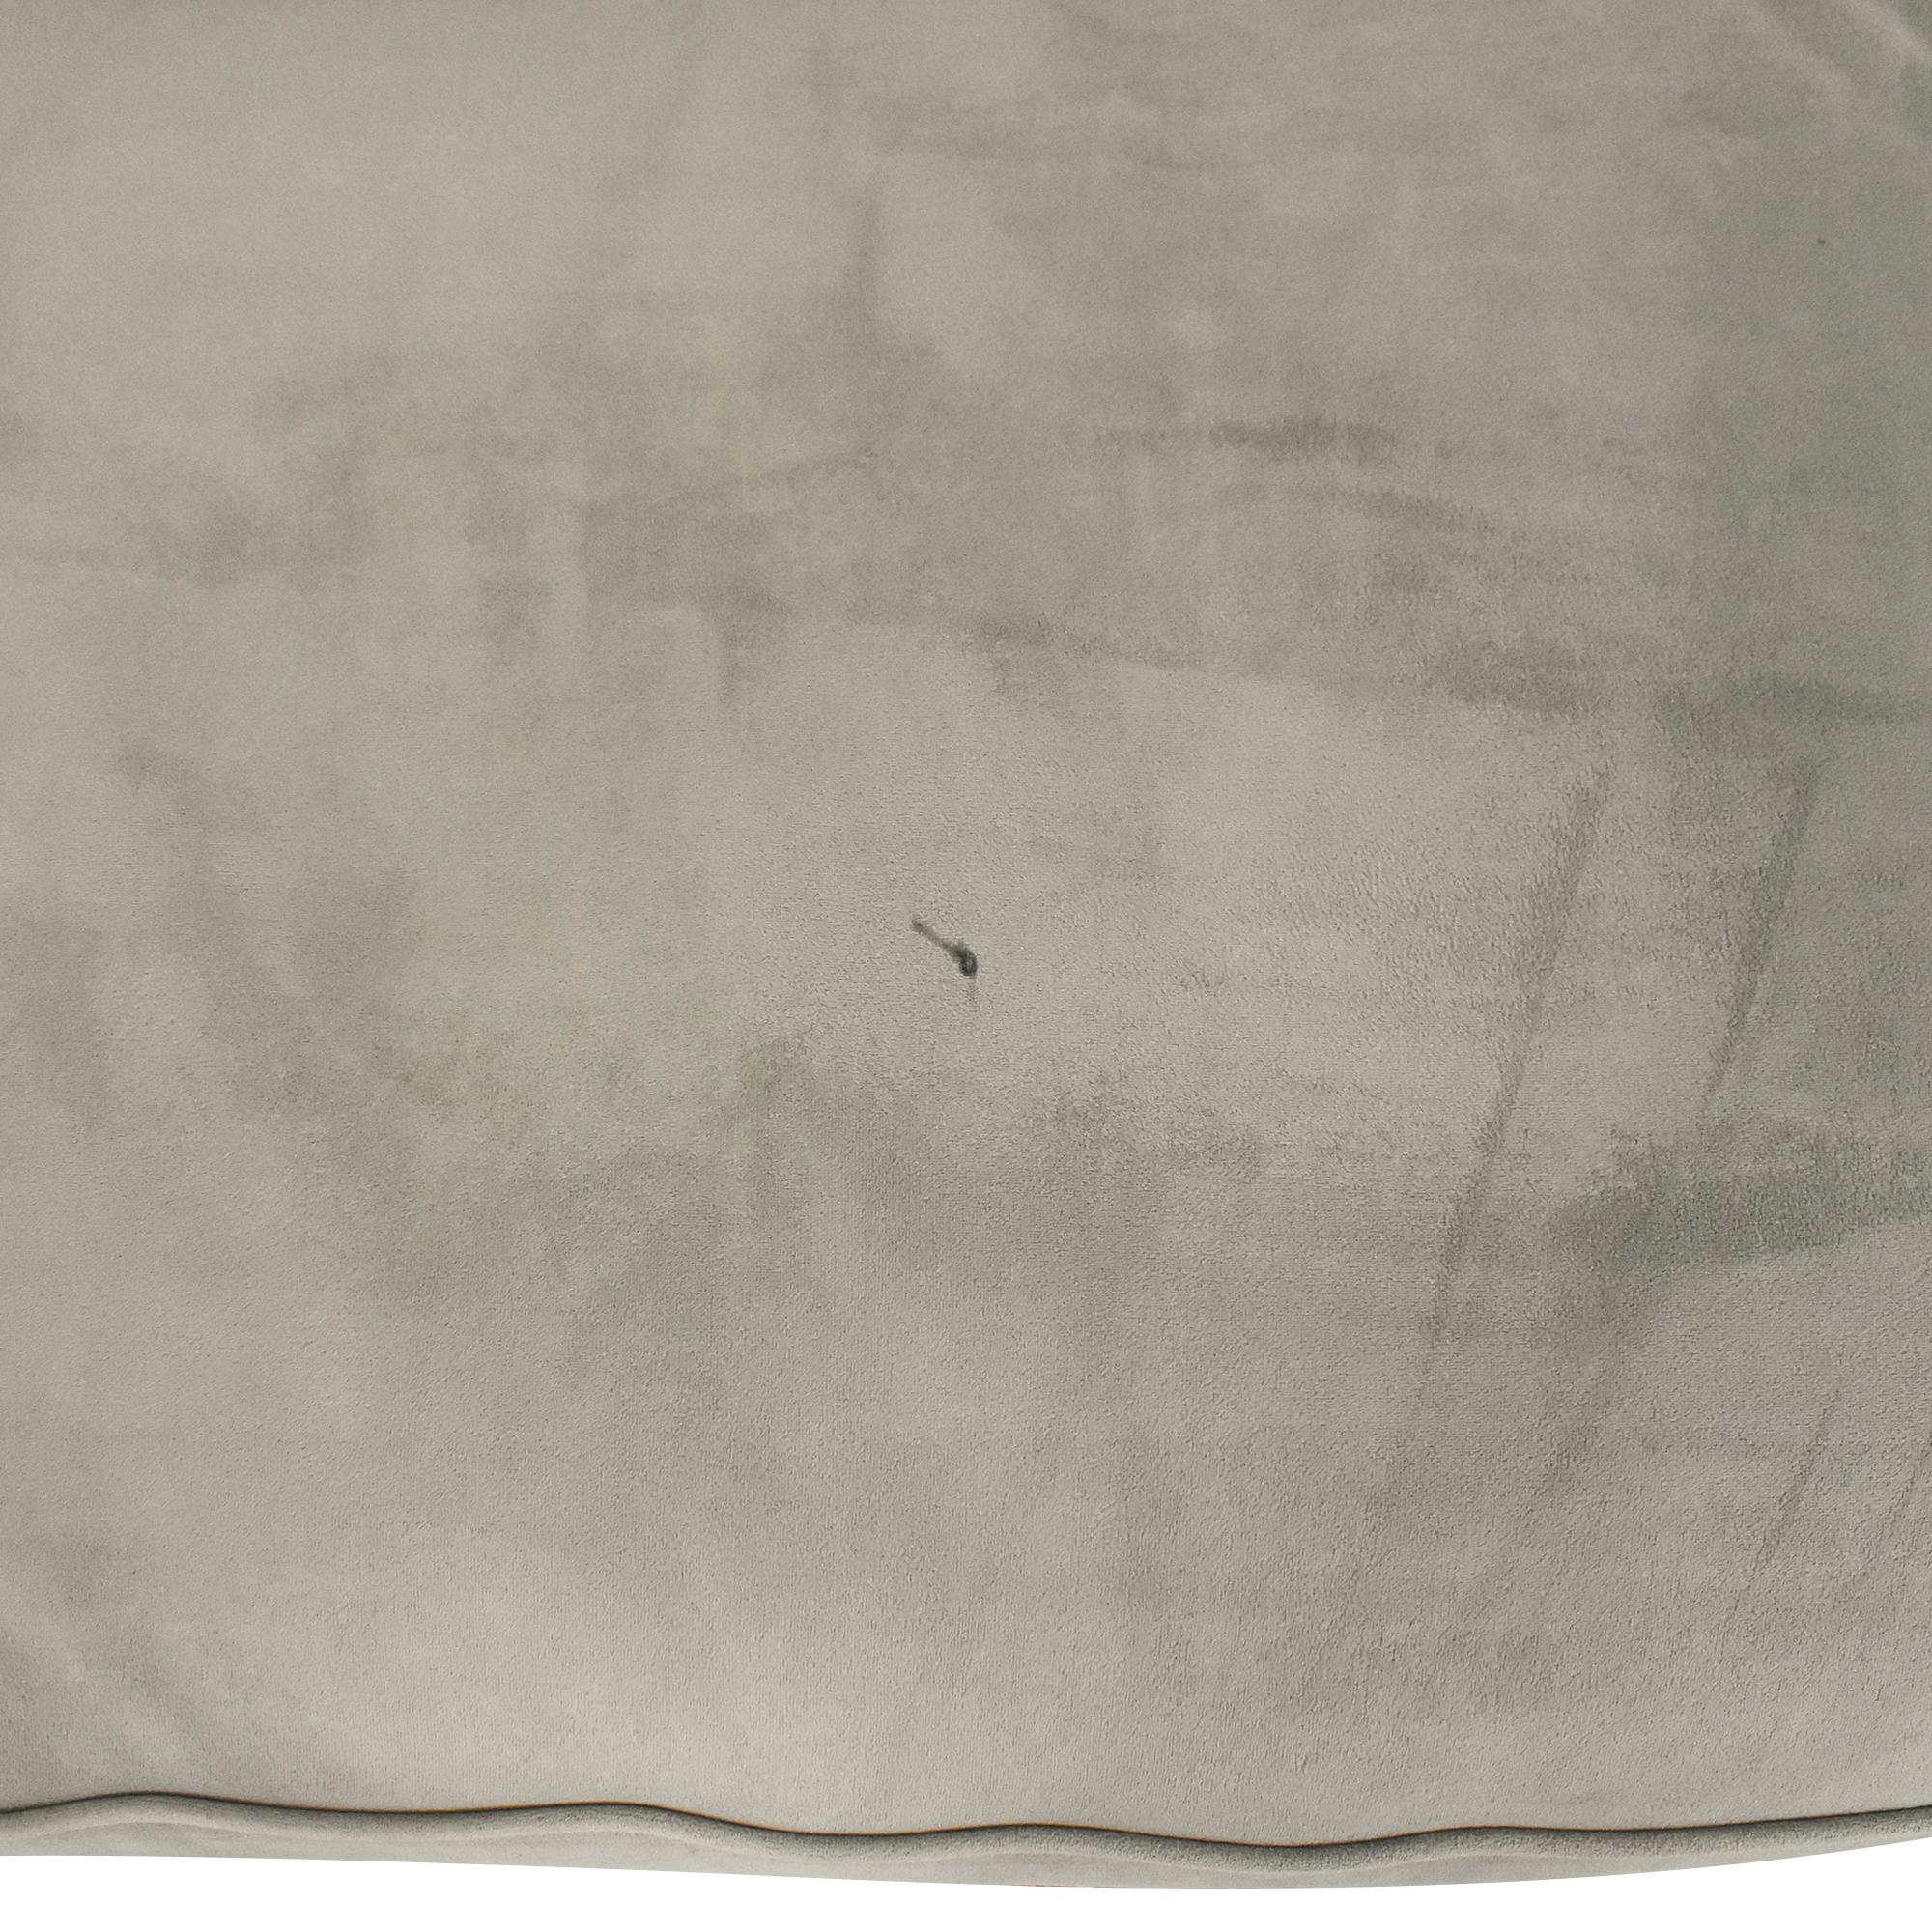 Macy's Macy's Martha Stewart Collection Saybridge Chesterfield Sofa dimensions